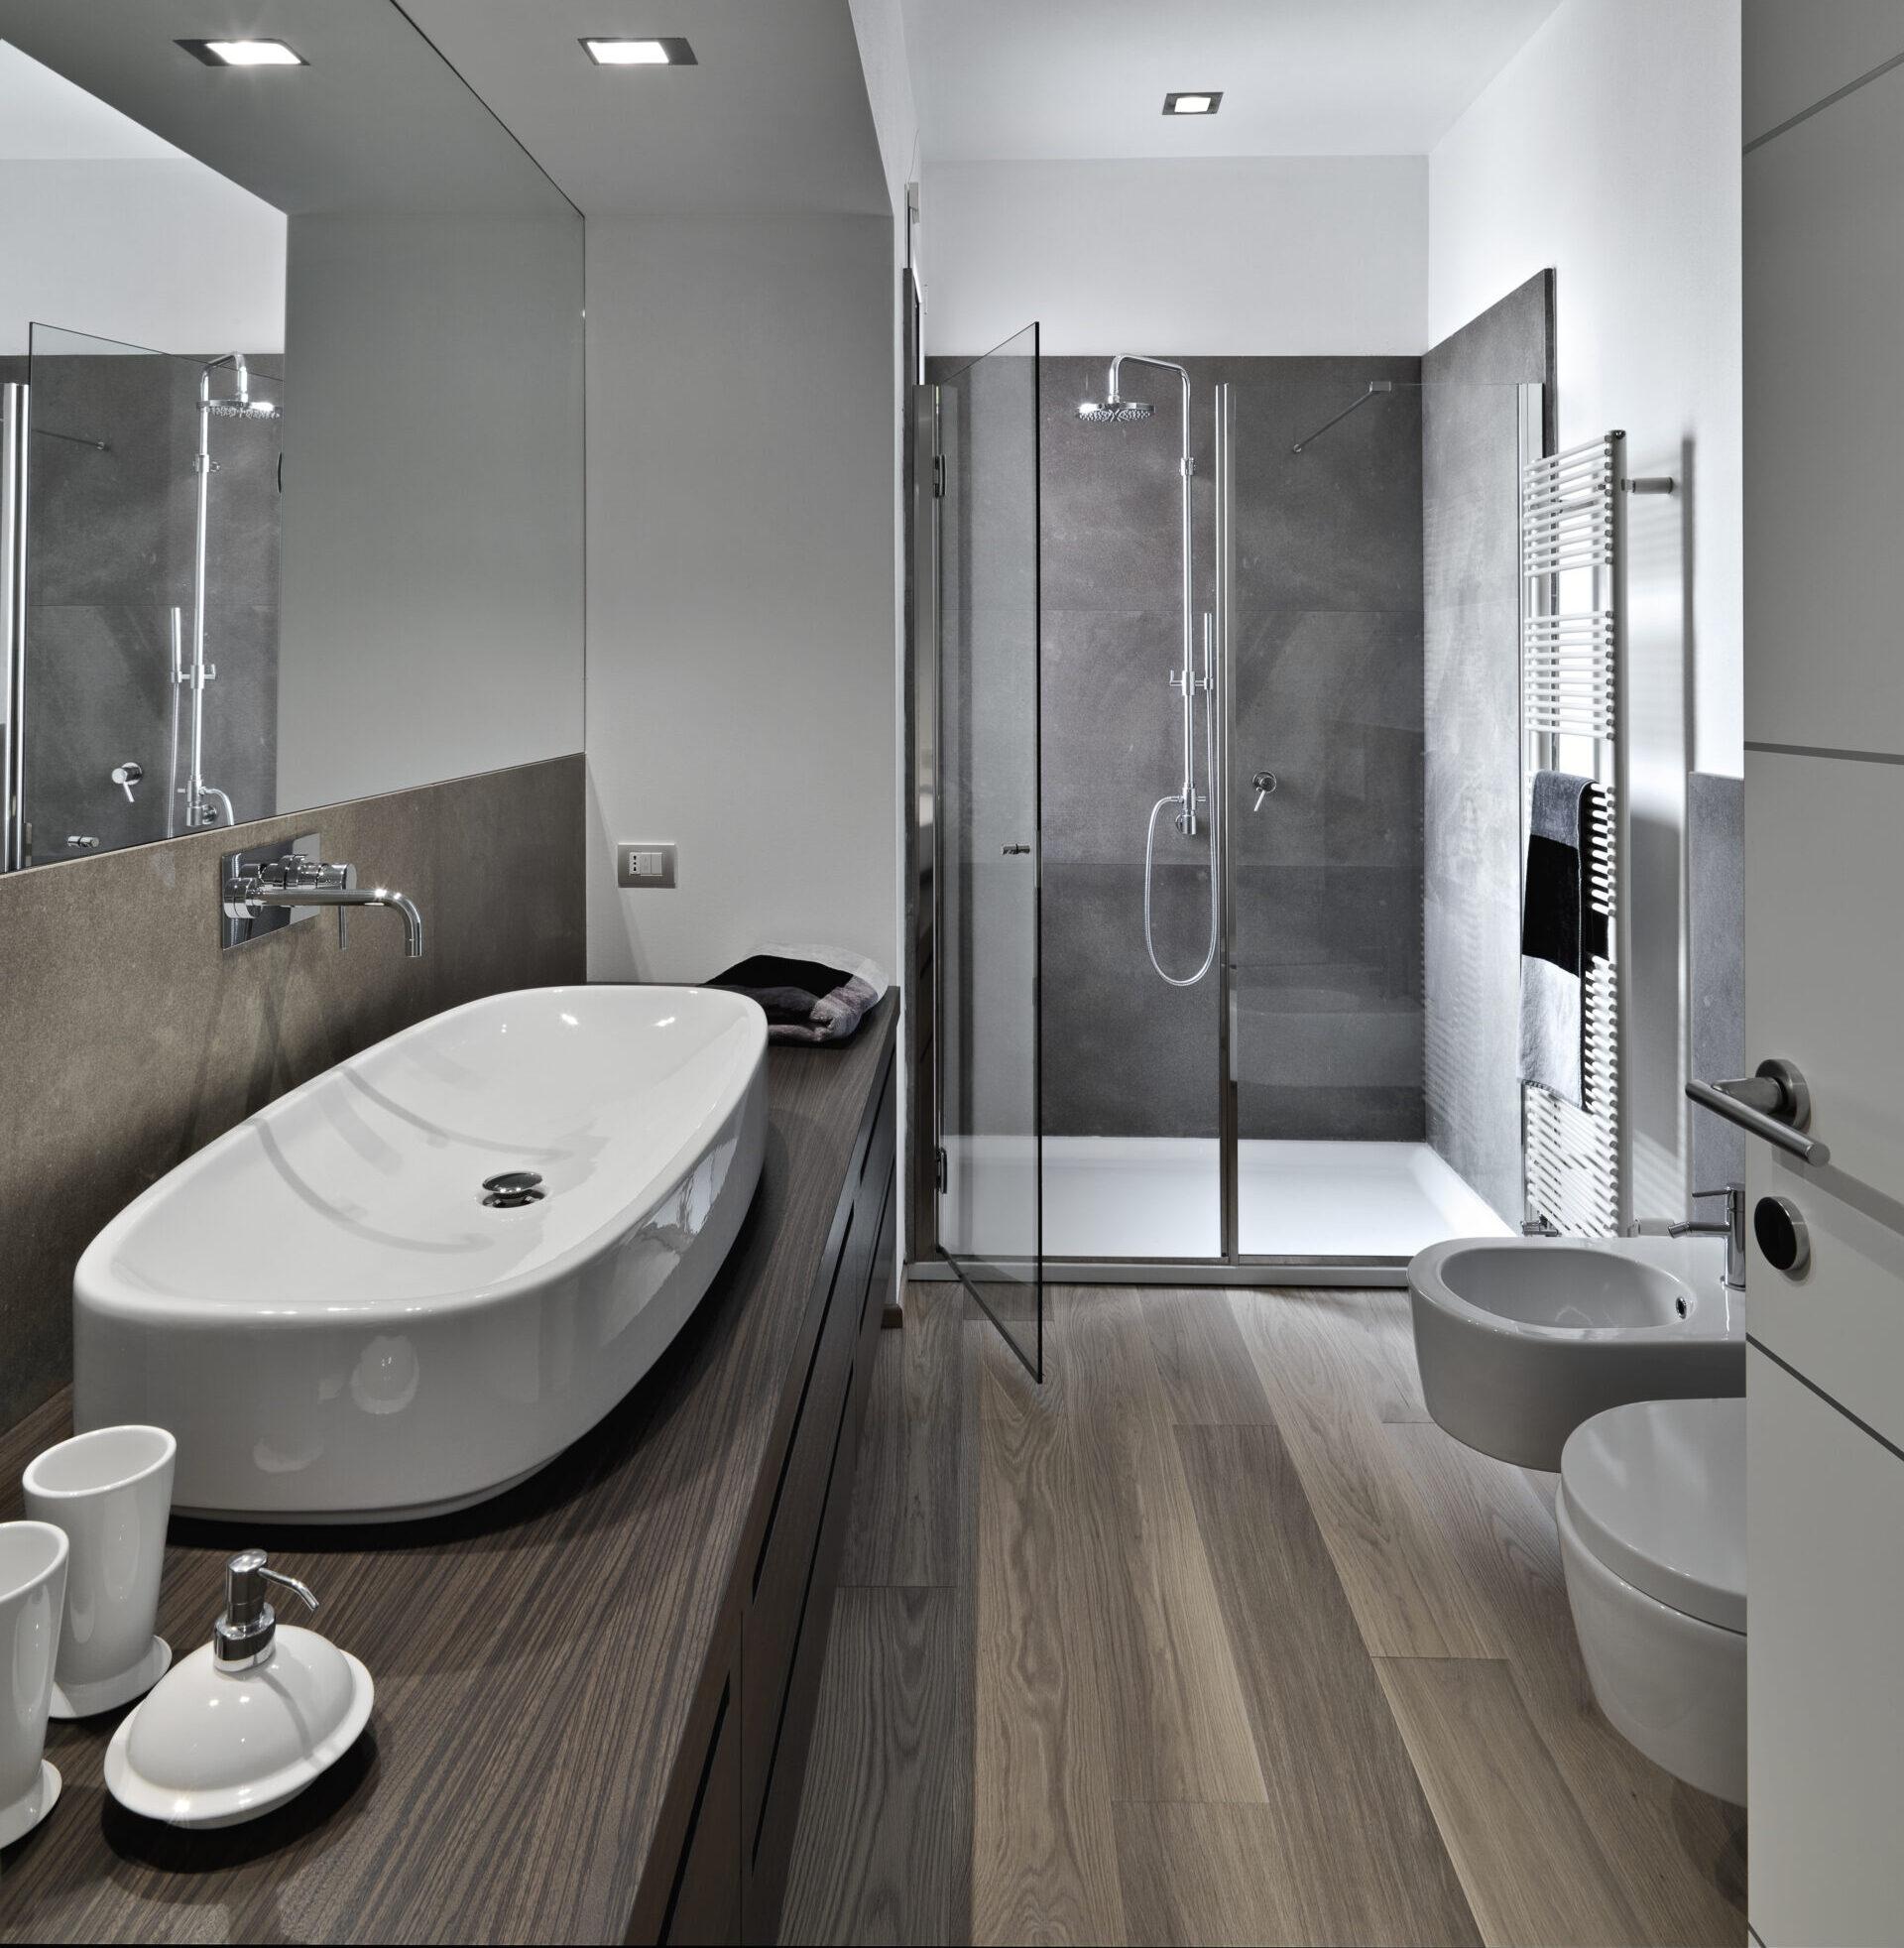 Bathroom Flooring, Should You Put Laminate Flooring In Bathrooms